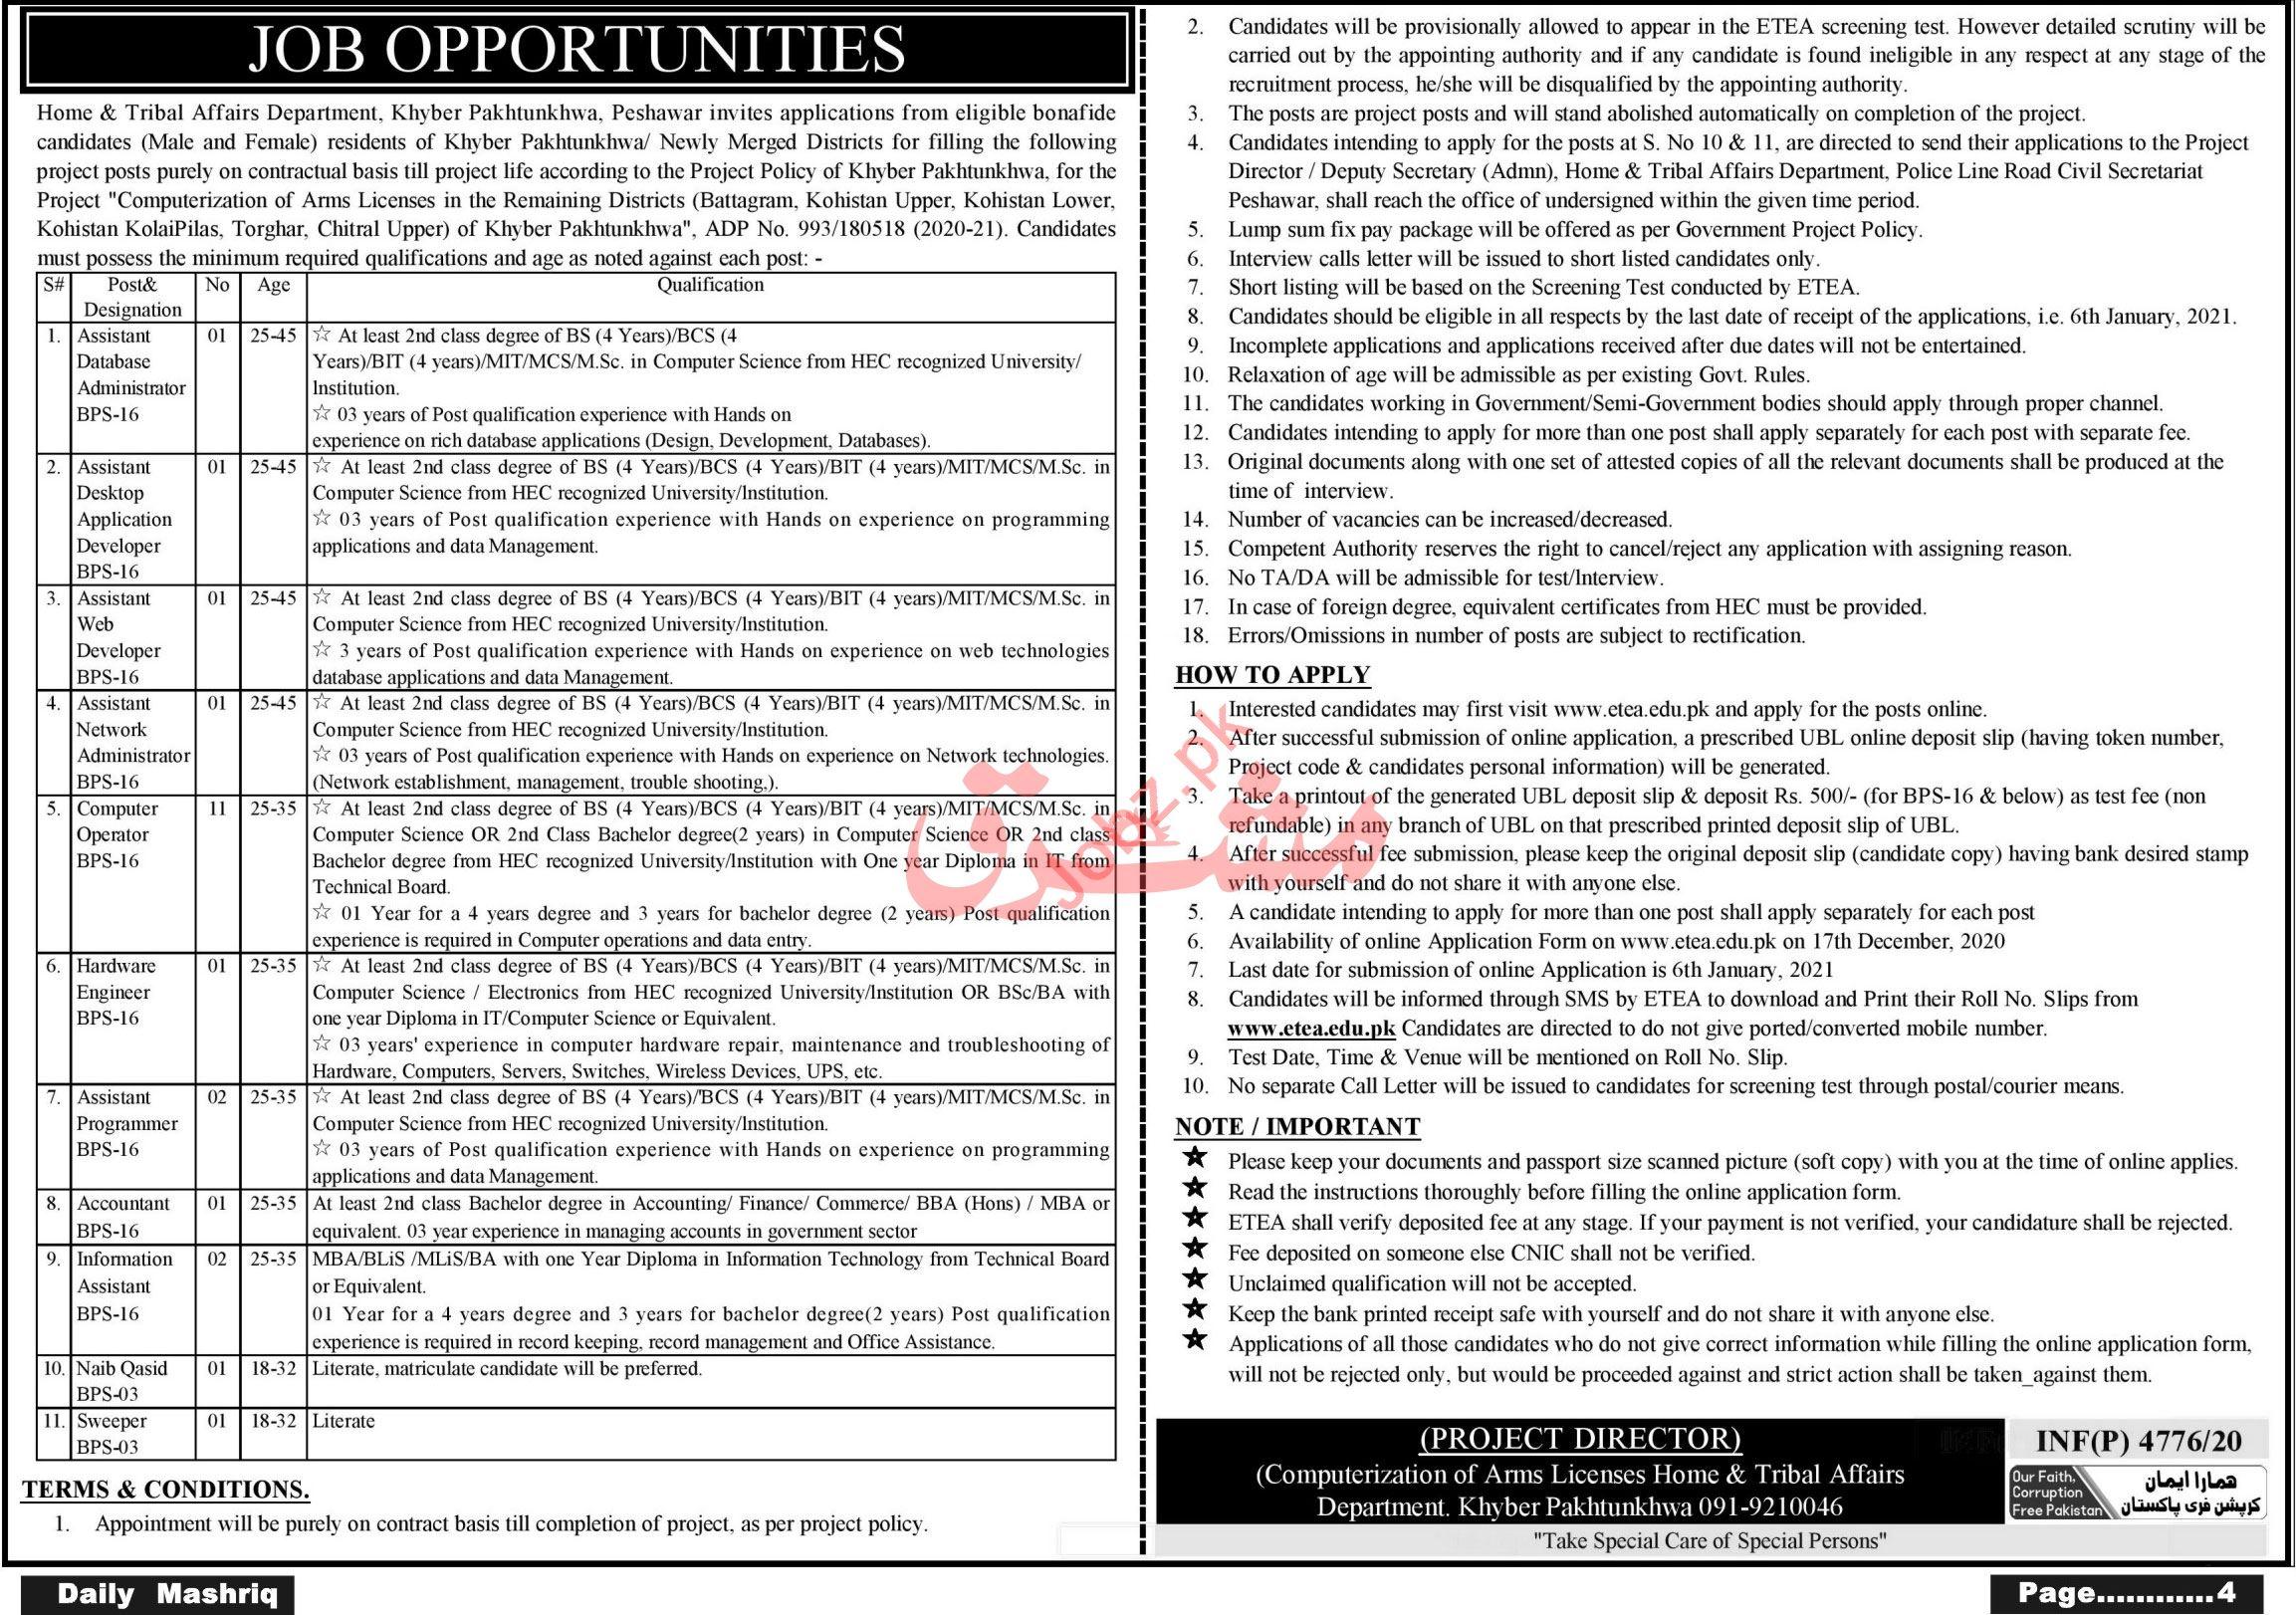 Home & Tribal Affairs Department Peshawar Jobs 2021